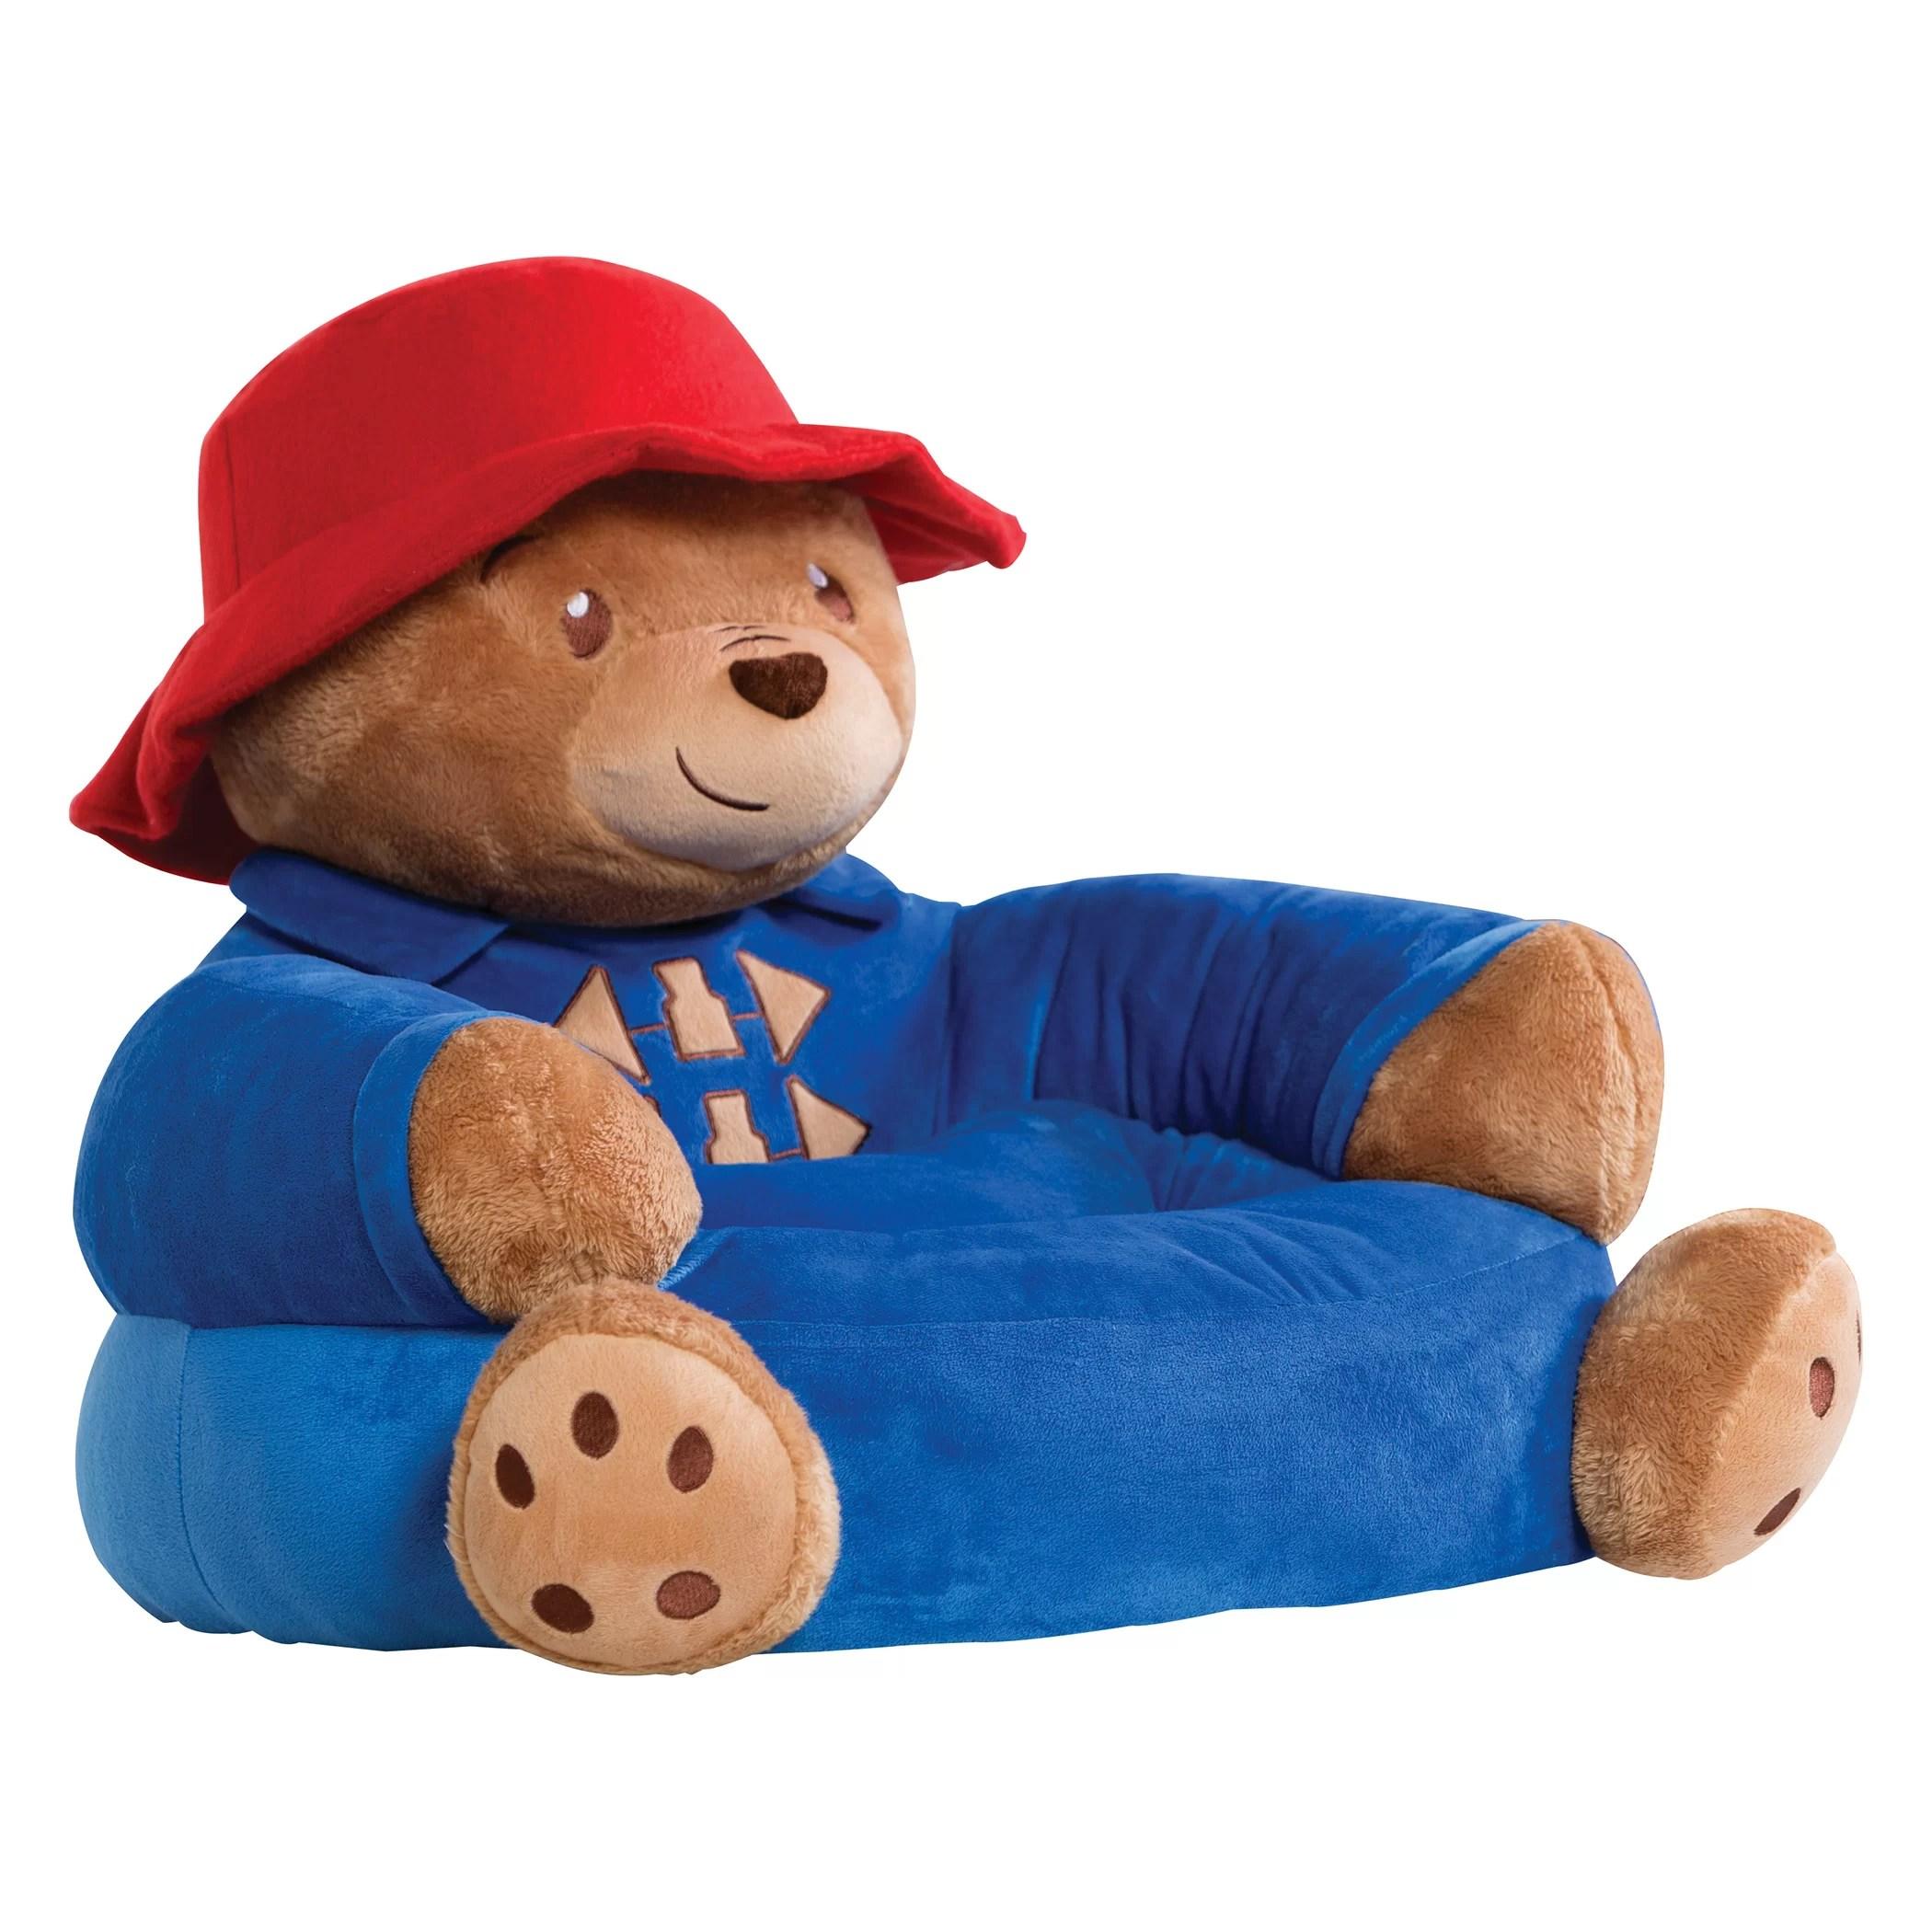 kids character chairs chair cover elegance omaha trend lab paddington bear children 39s plush